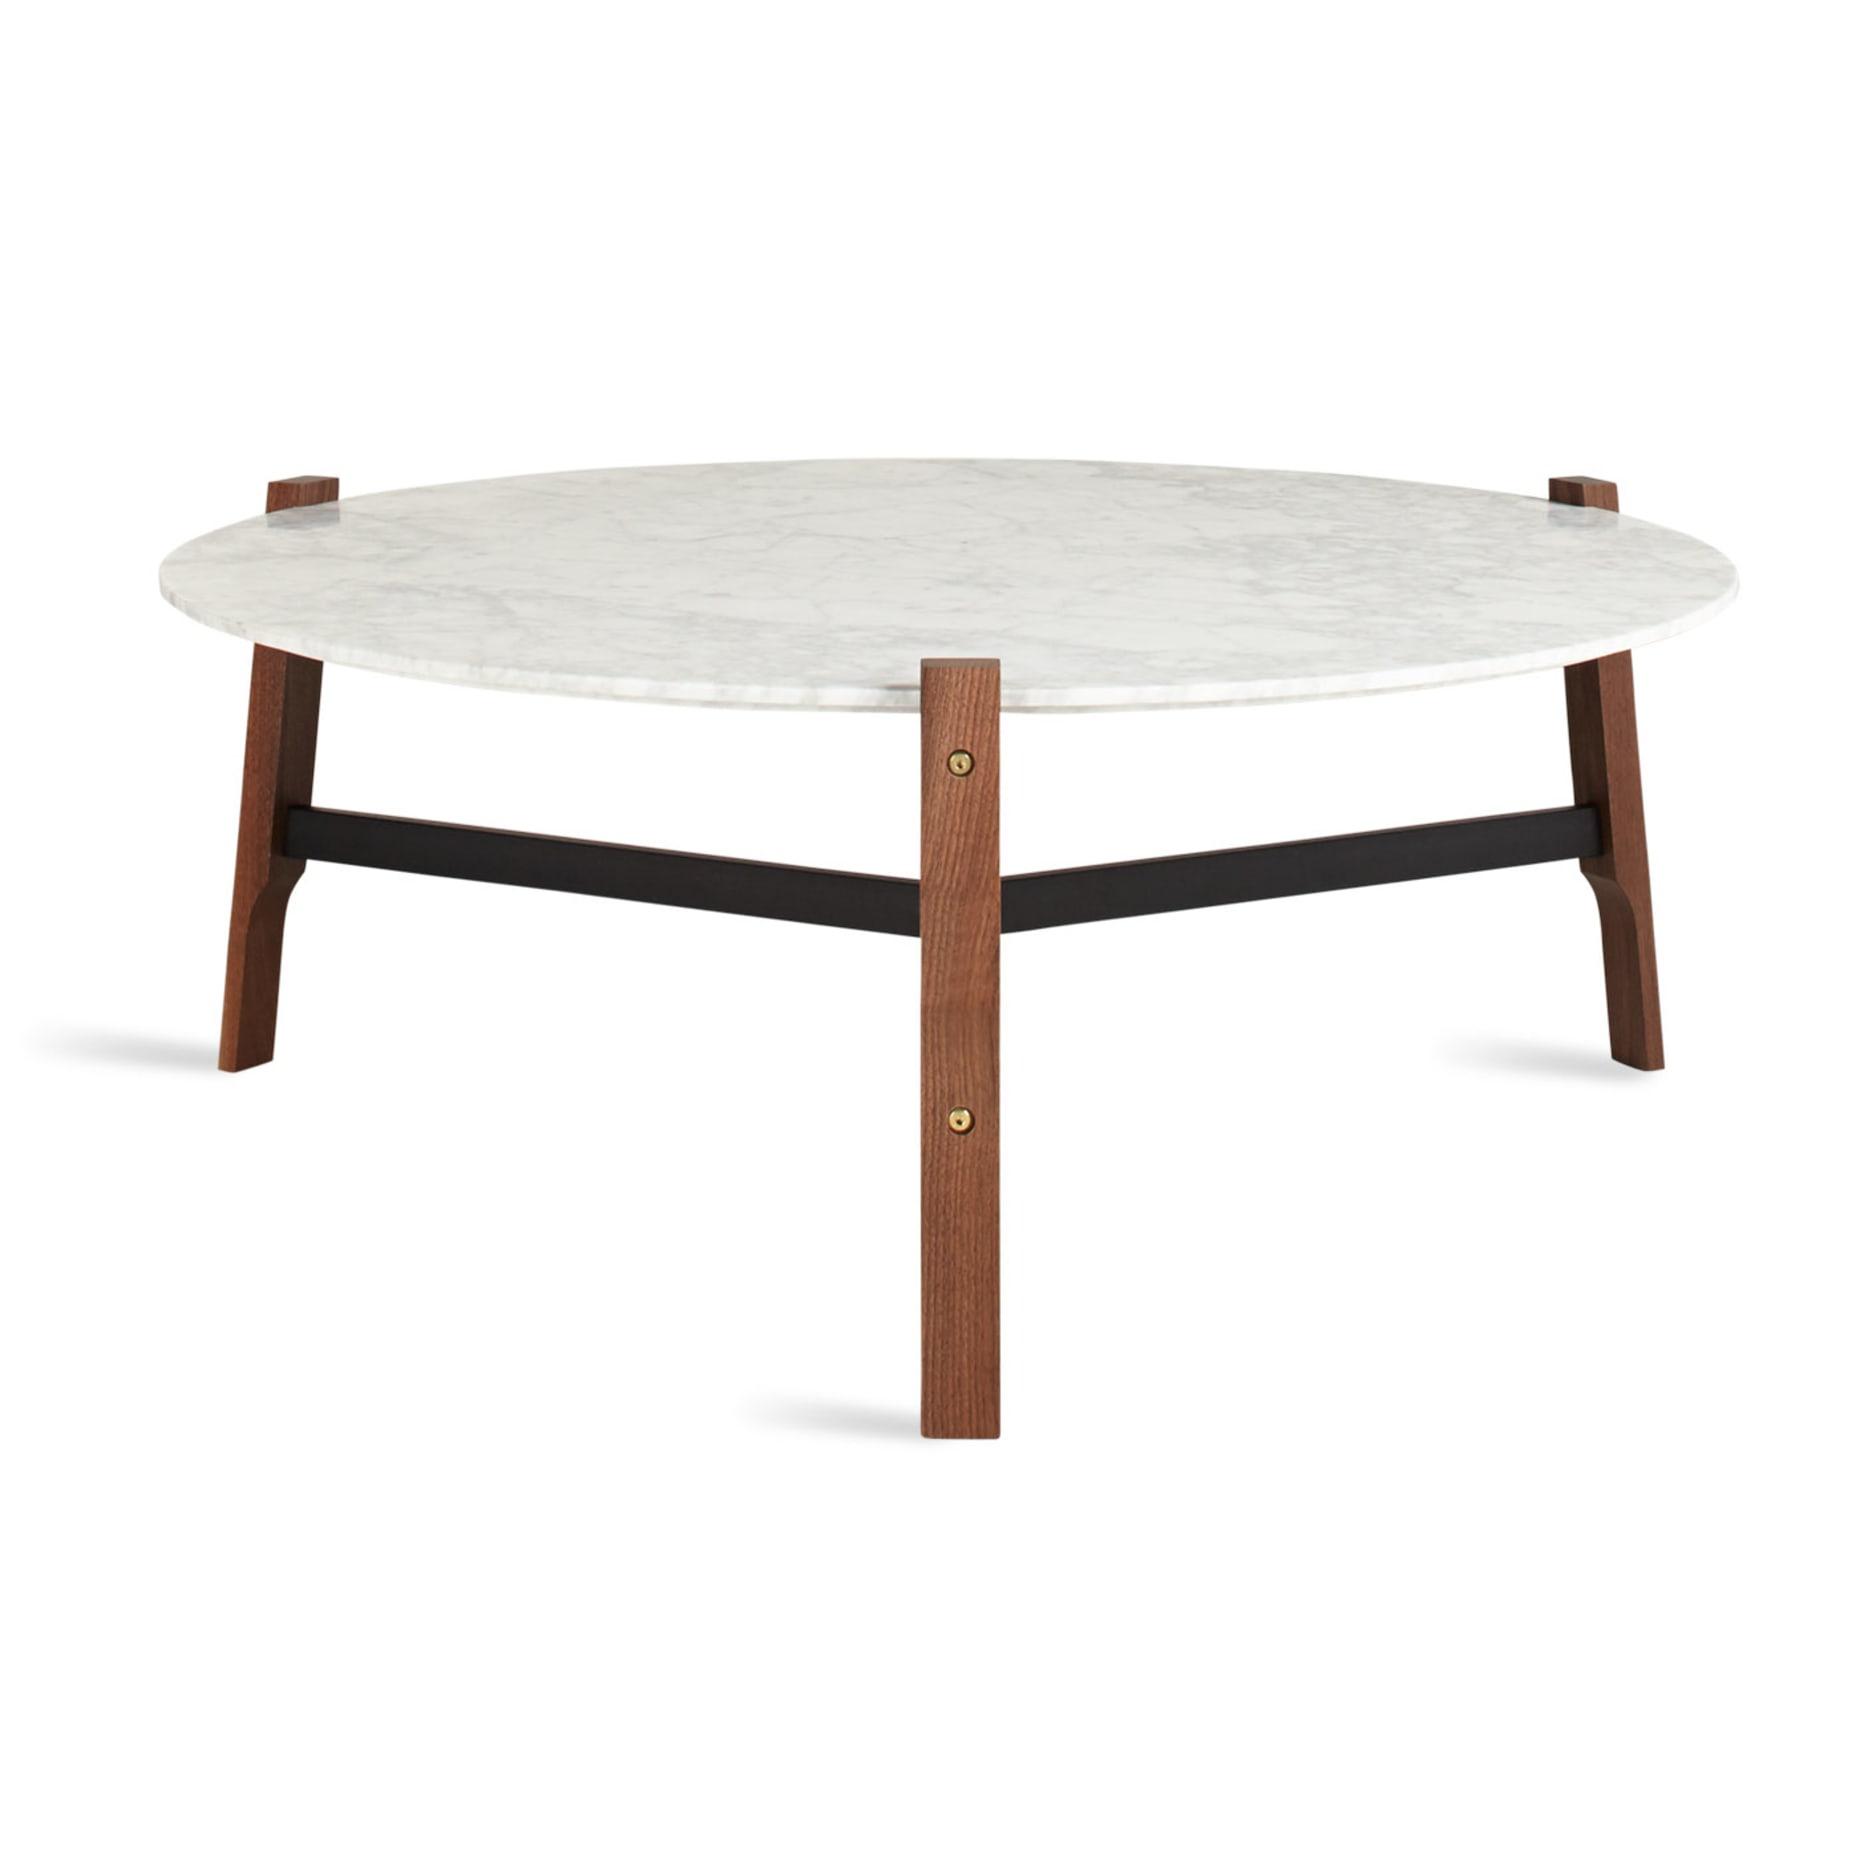 Free Range Coffee Table Round Marble Coffee Table Blu Dot regarding size 1860 X 1860